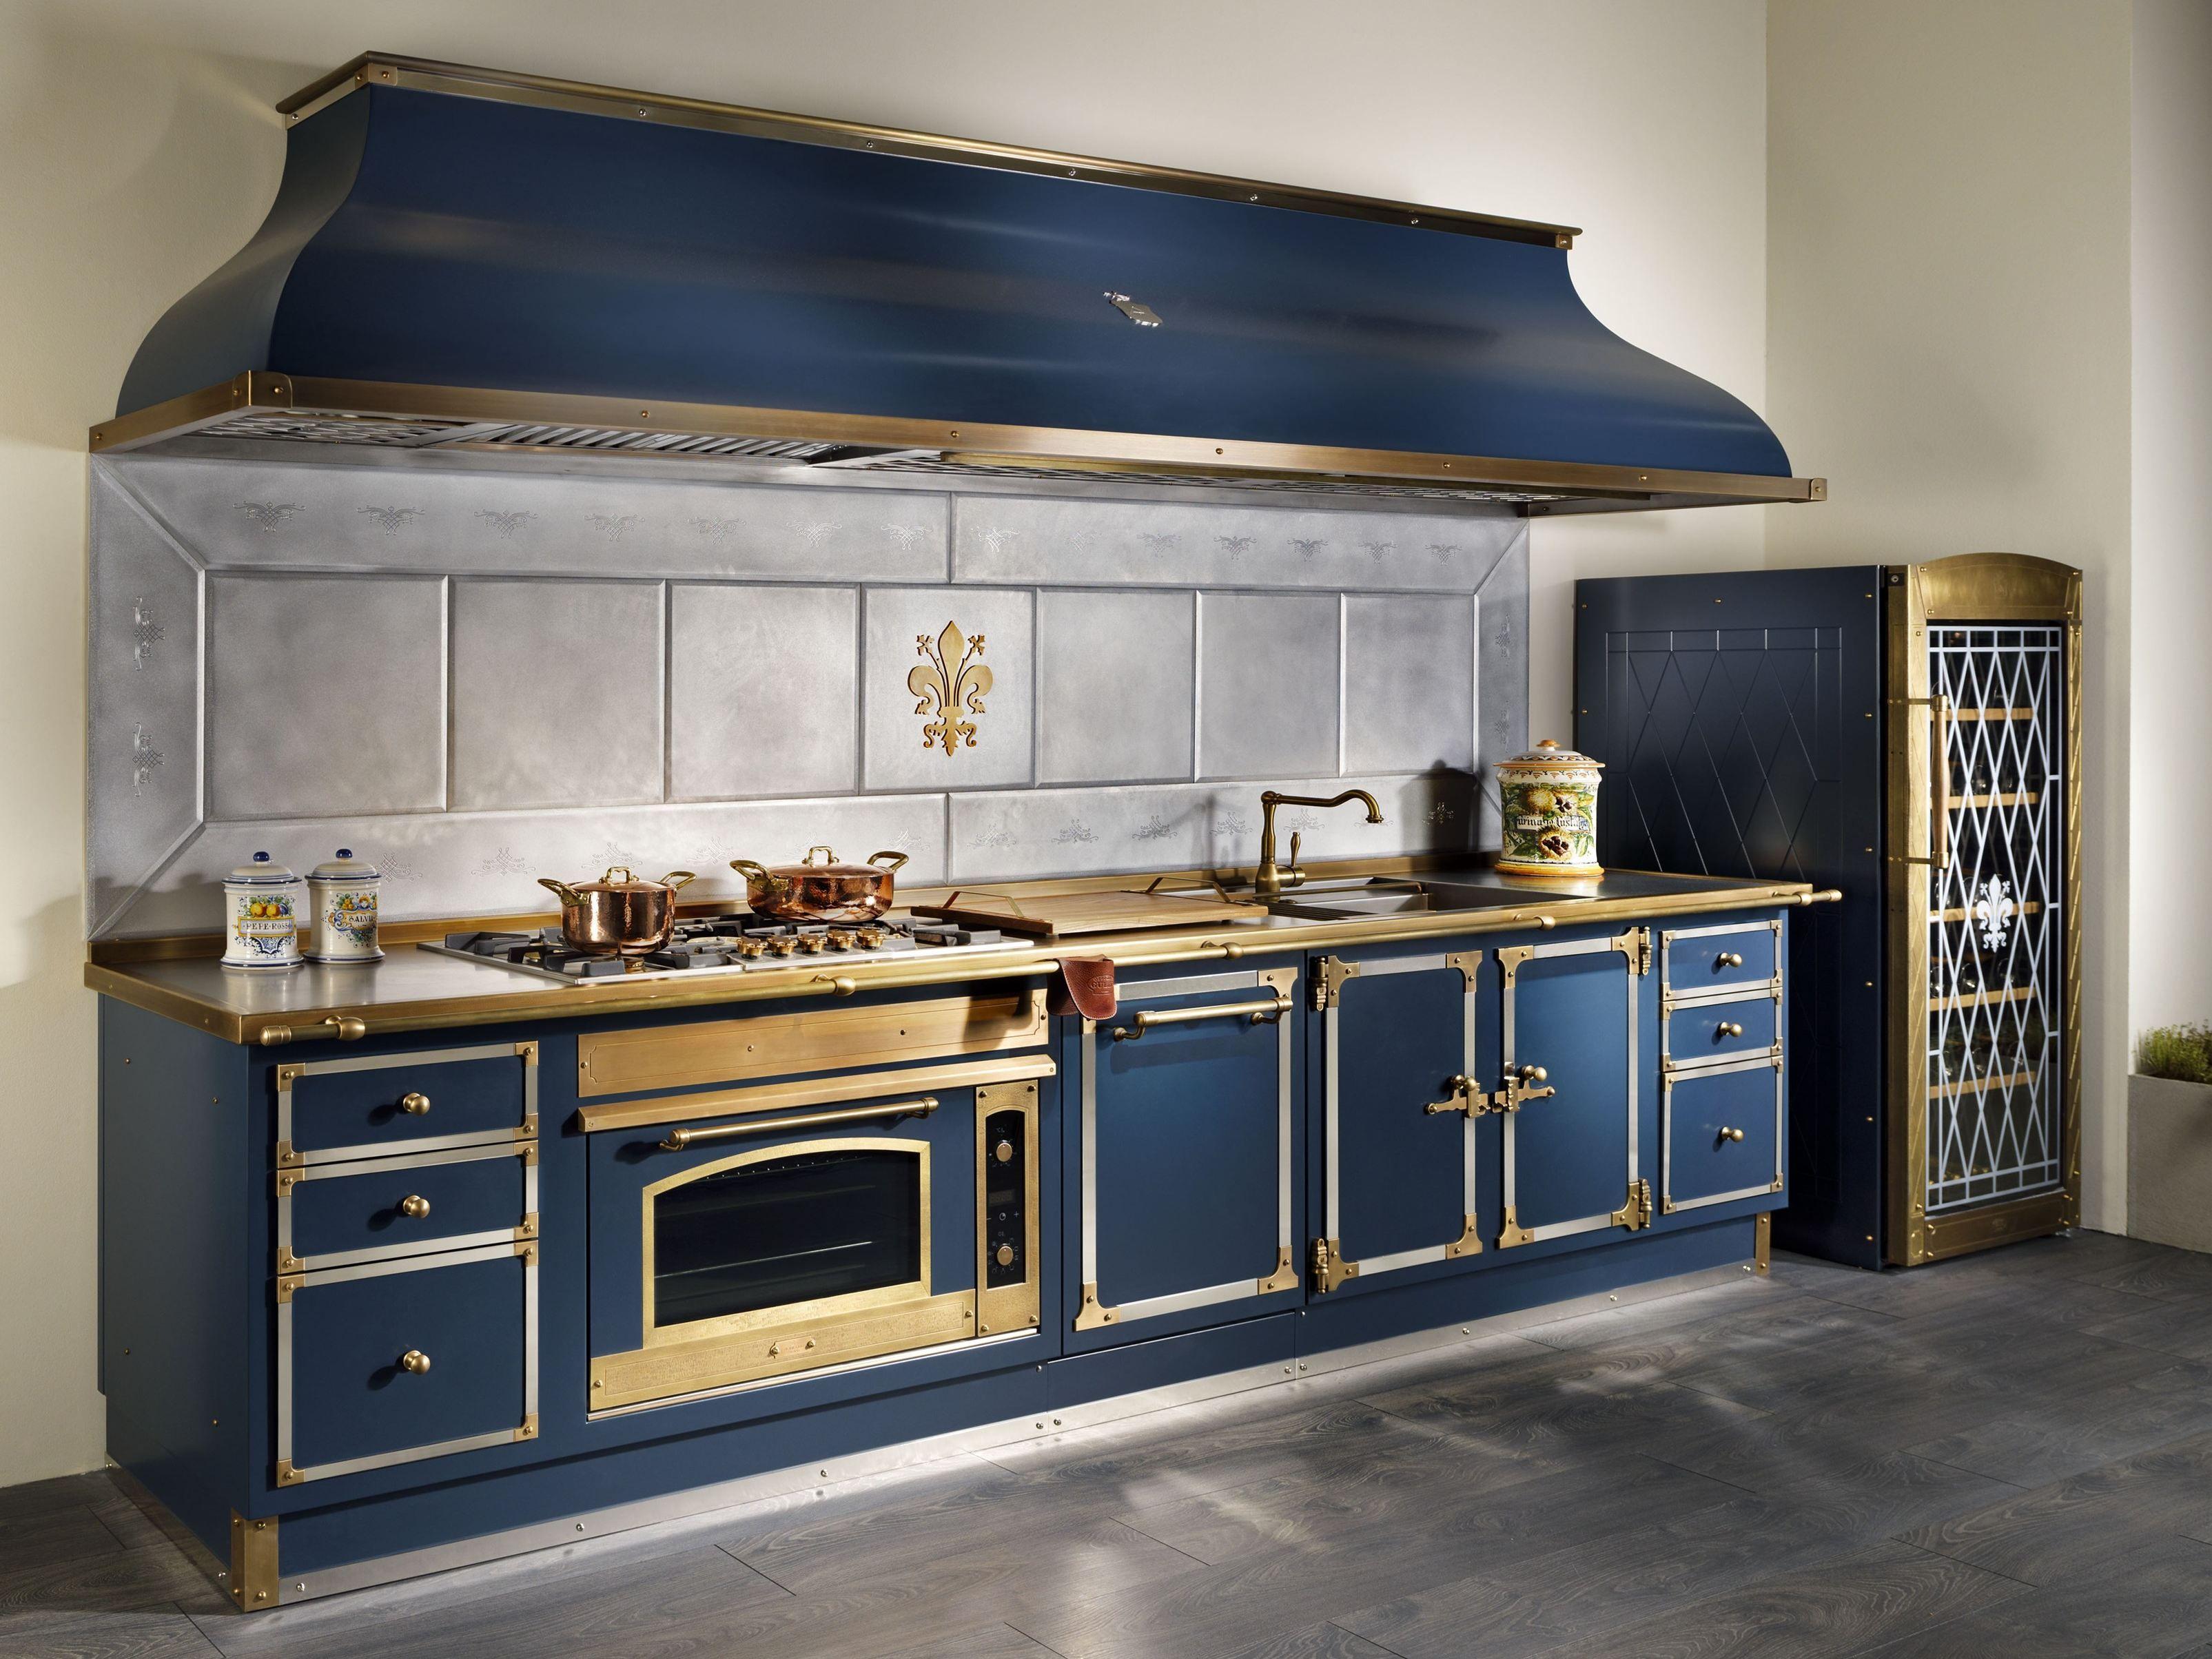 Cucine Officine Gullo : Cuisine linéaire en métal deep blue by officine gullo